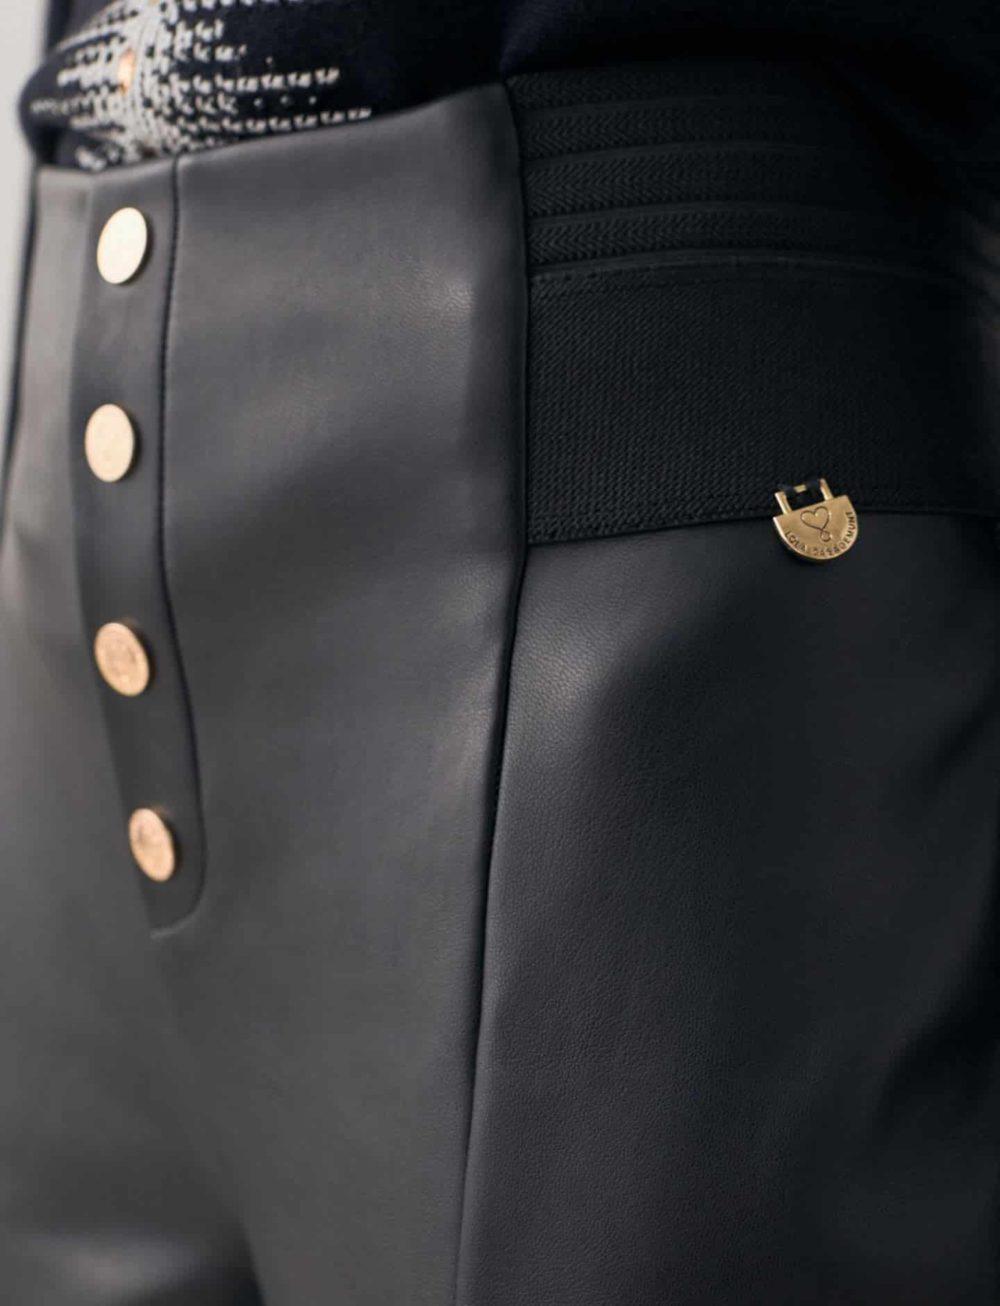 legging-efecto-piel-negro-detalle-botonera